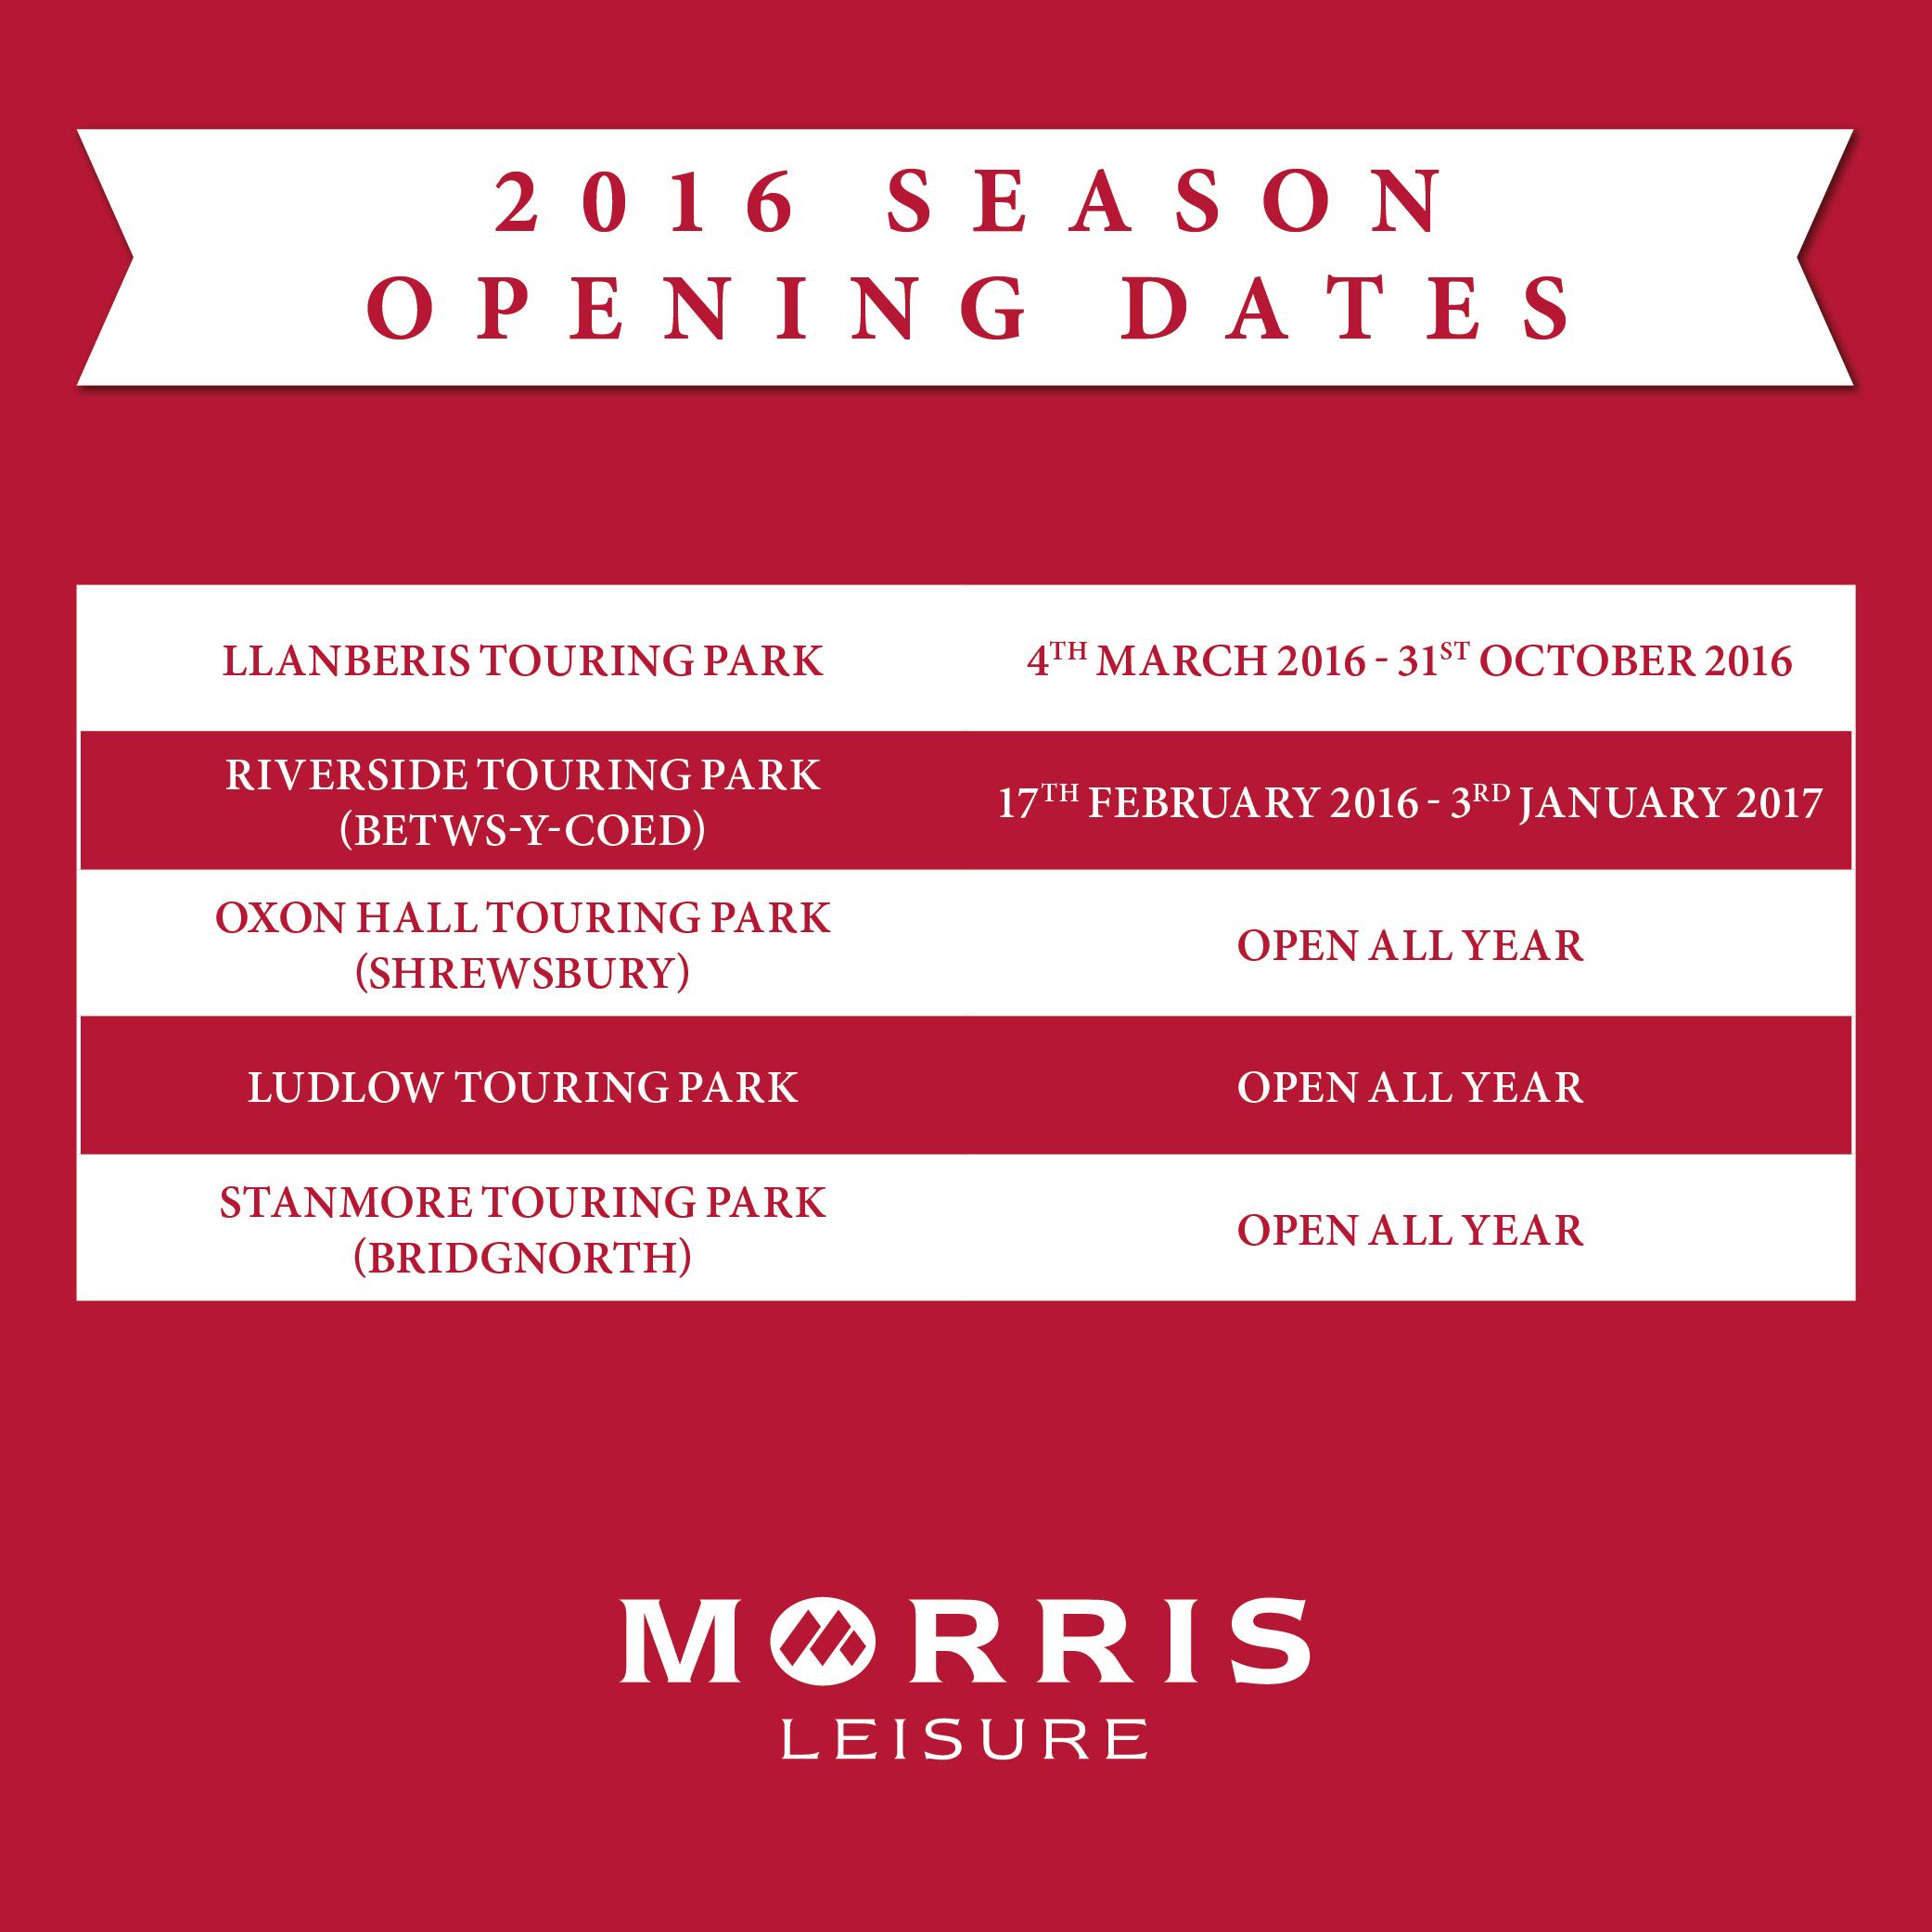 Season Dates and Bag Limits